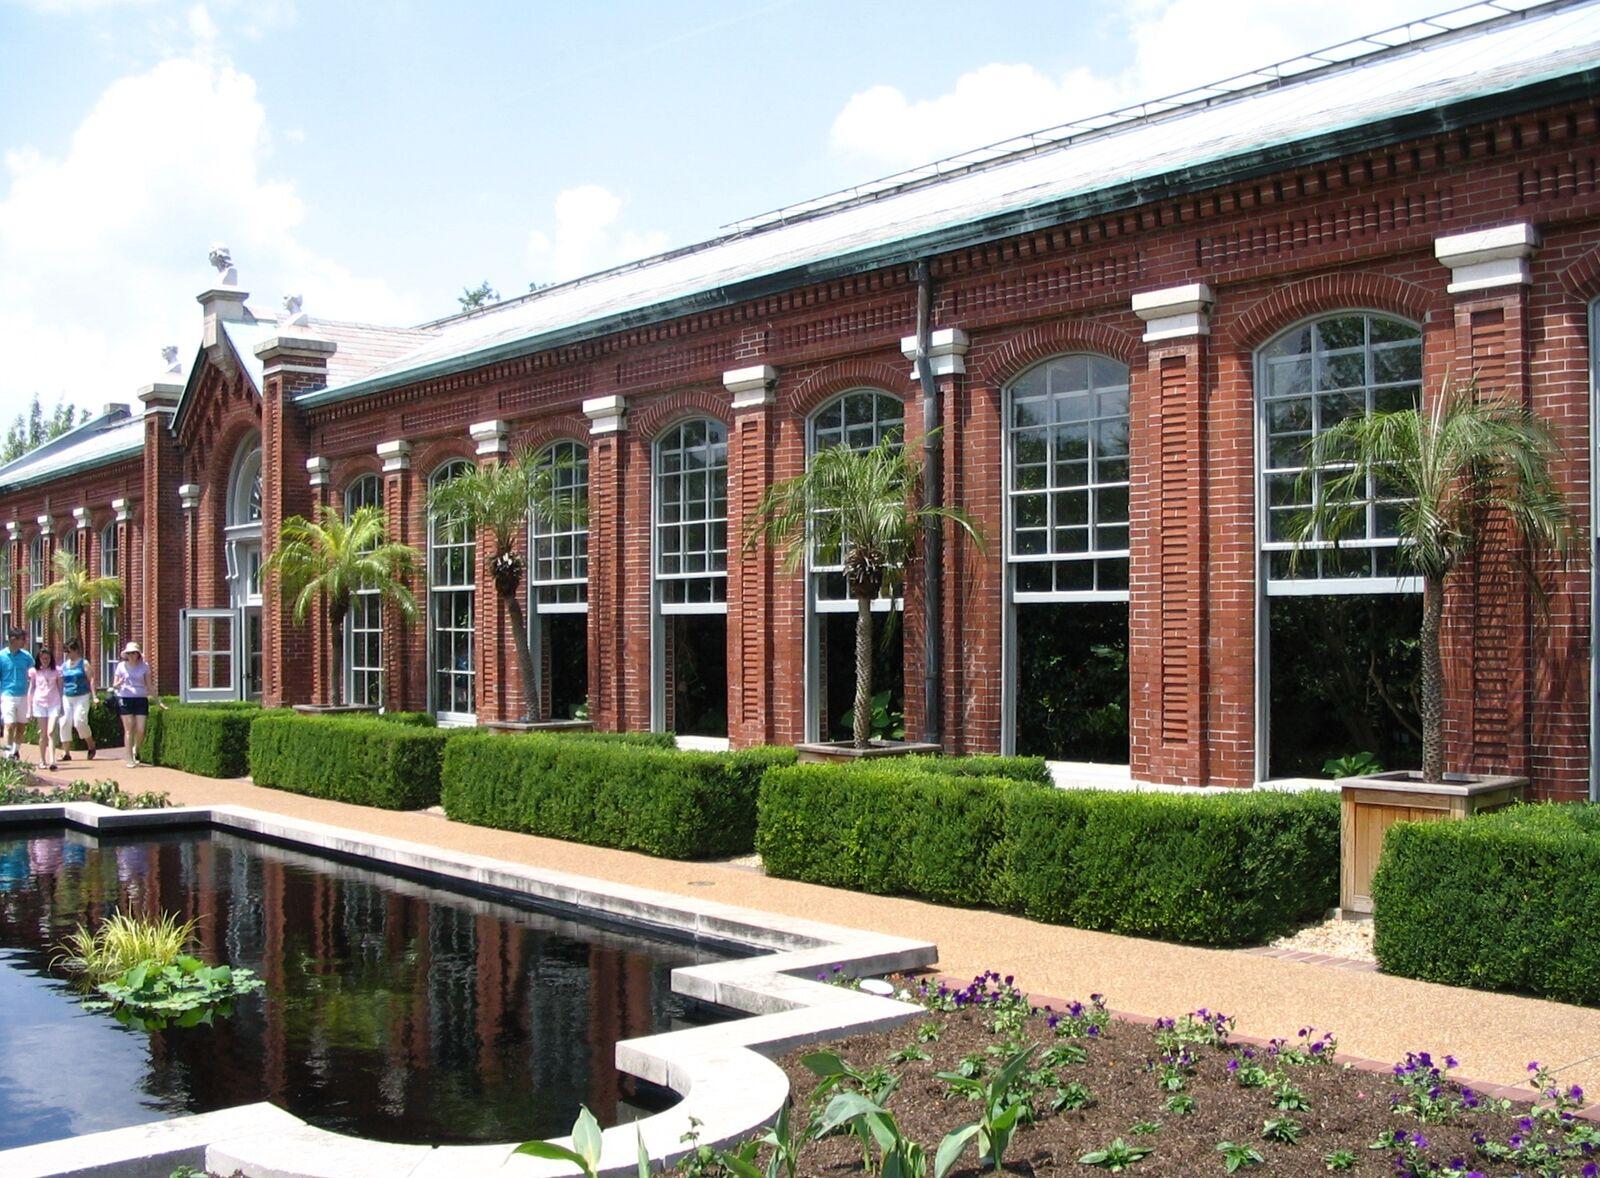 Trip to Missouri Botanical Garden